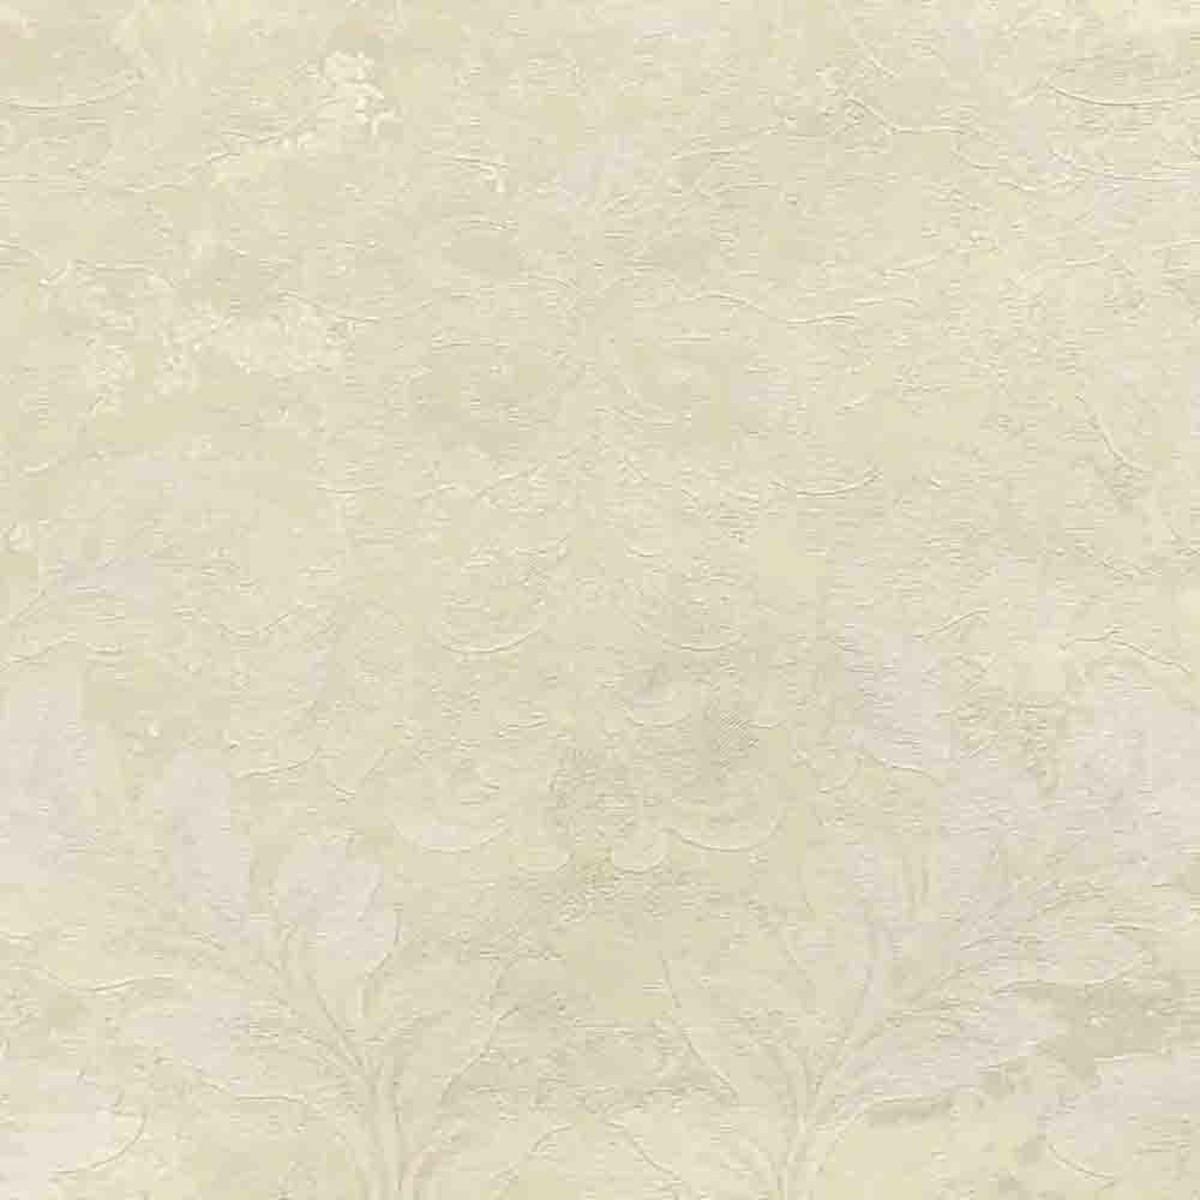 Обои флизелиновые Yien Colorato желтые 1.06 м 51016-1